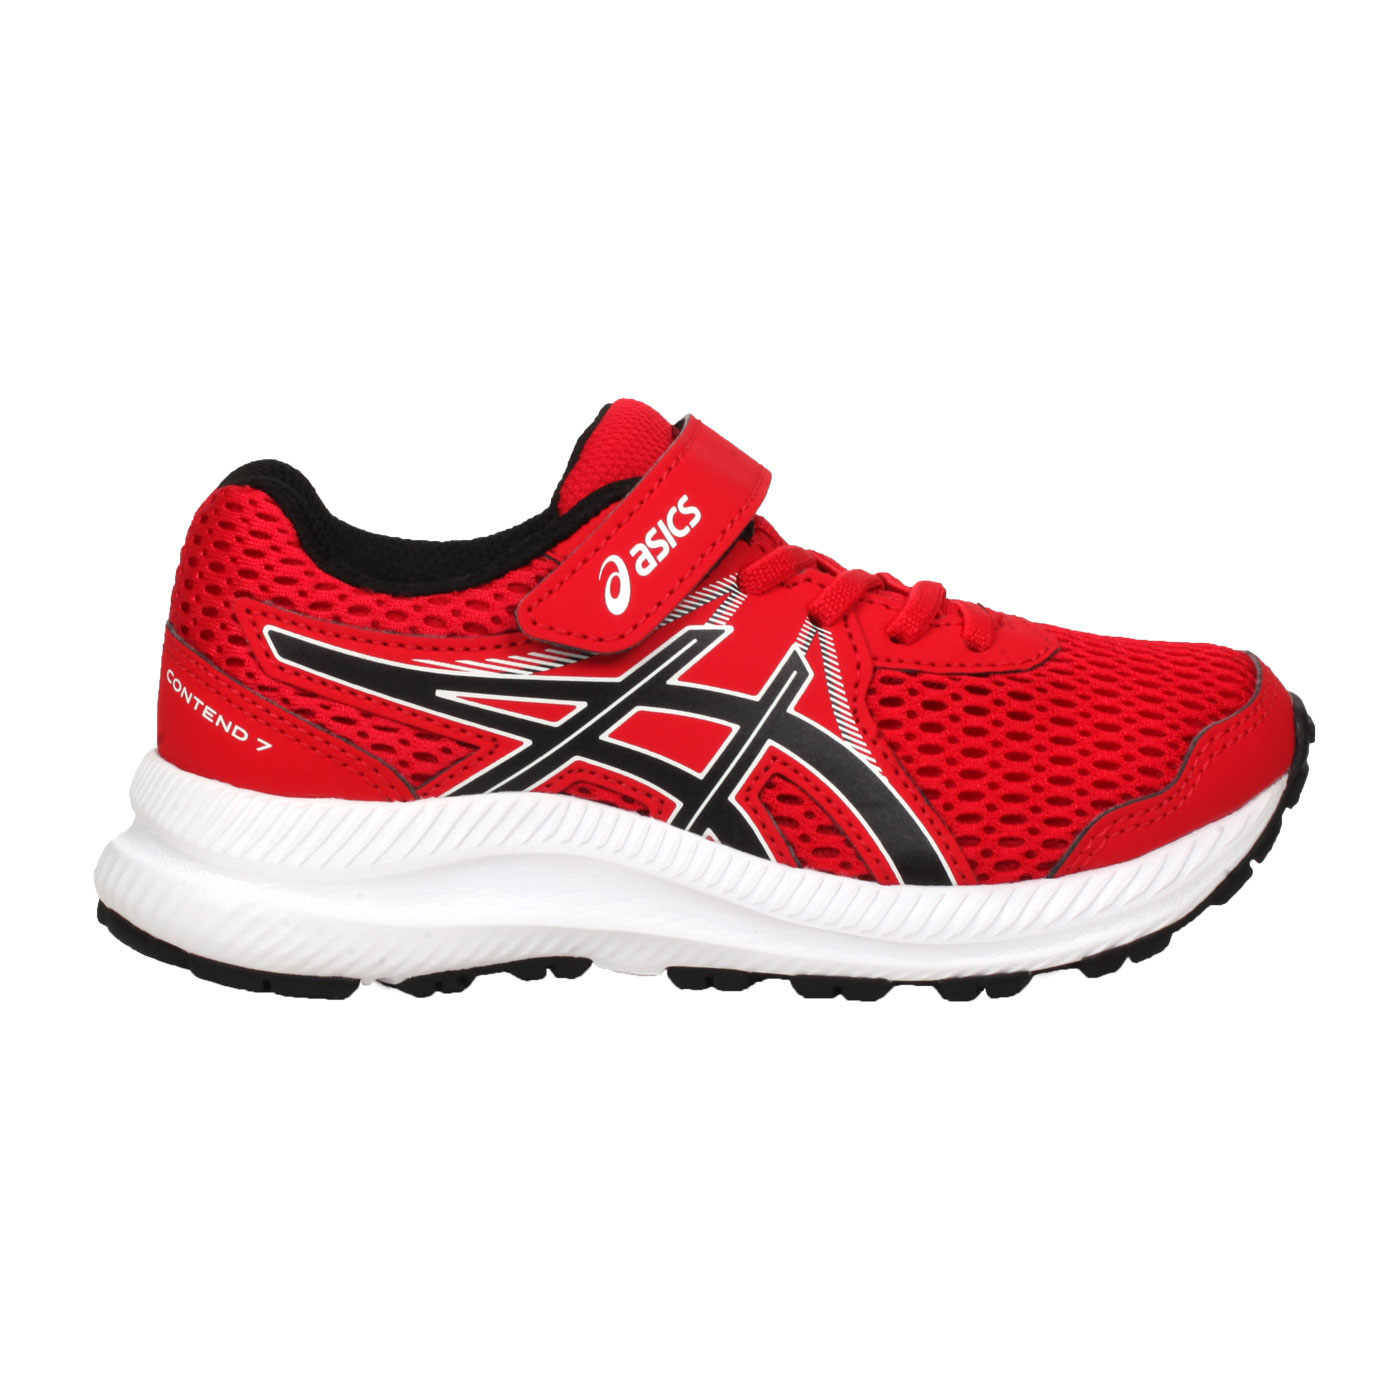 ASICS 中童慢跑鞋  @CONTEND 7 PS@1014A194-600 - 紅黑白